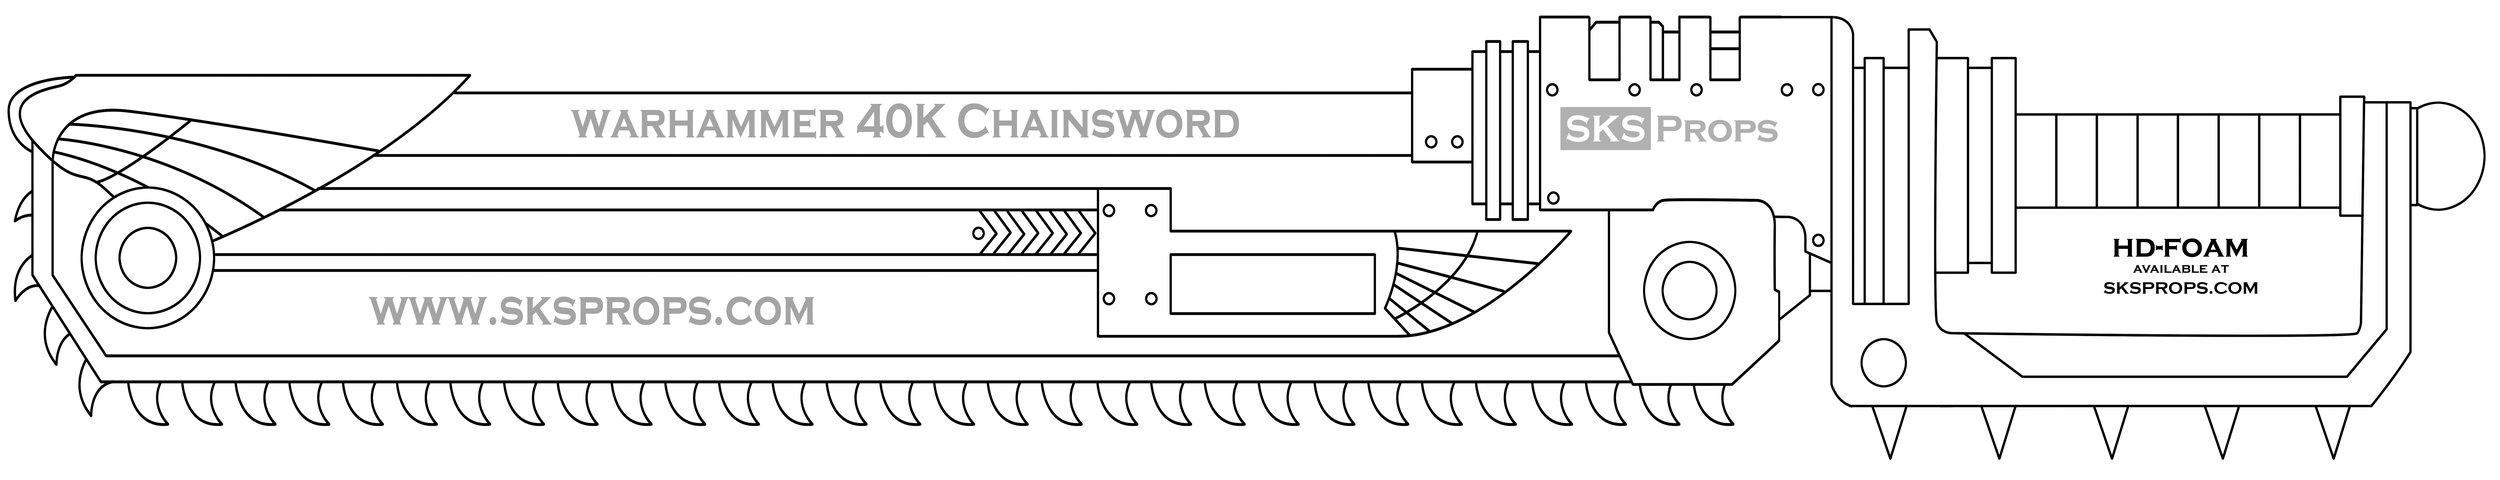 40K chainsword.jpg